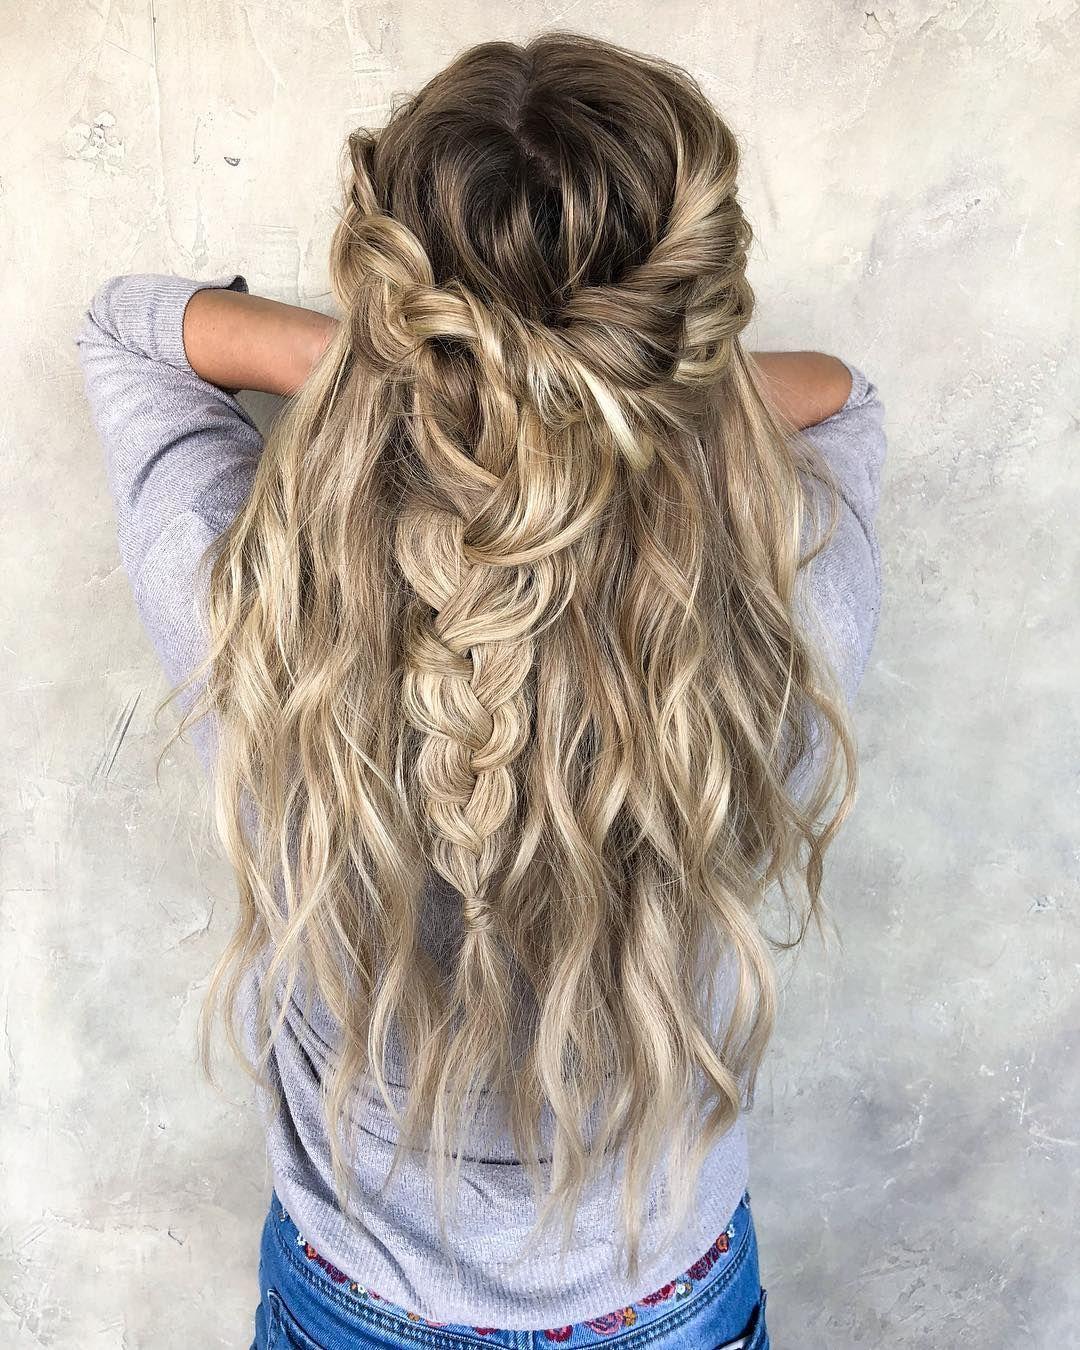 boho braid hairstyles to try blonde hair braid half up half